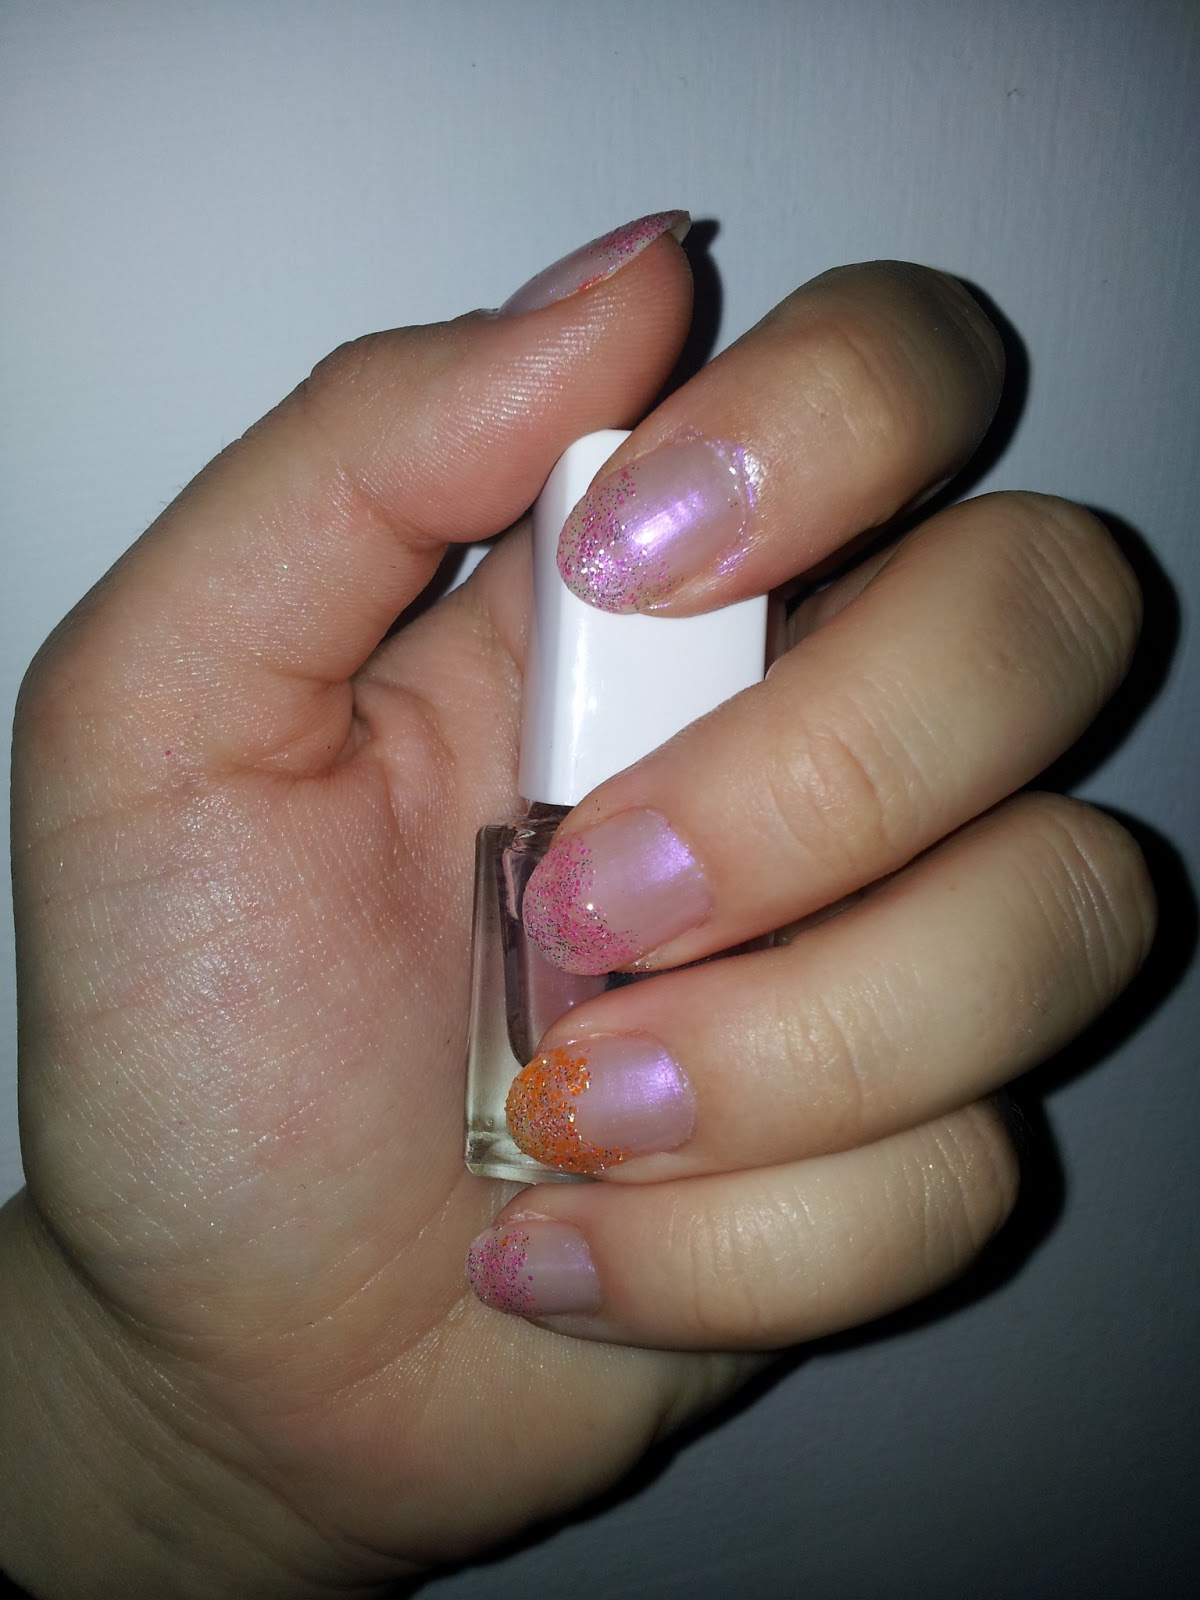 Delikatny manicure - róż z brokatem